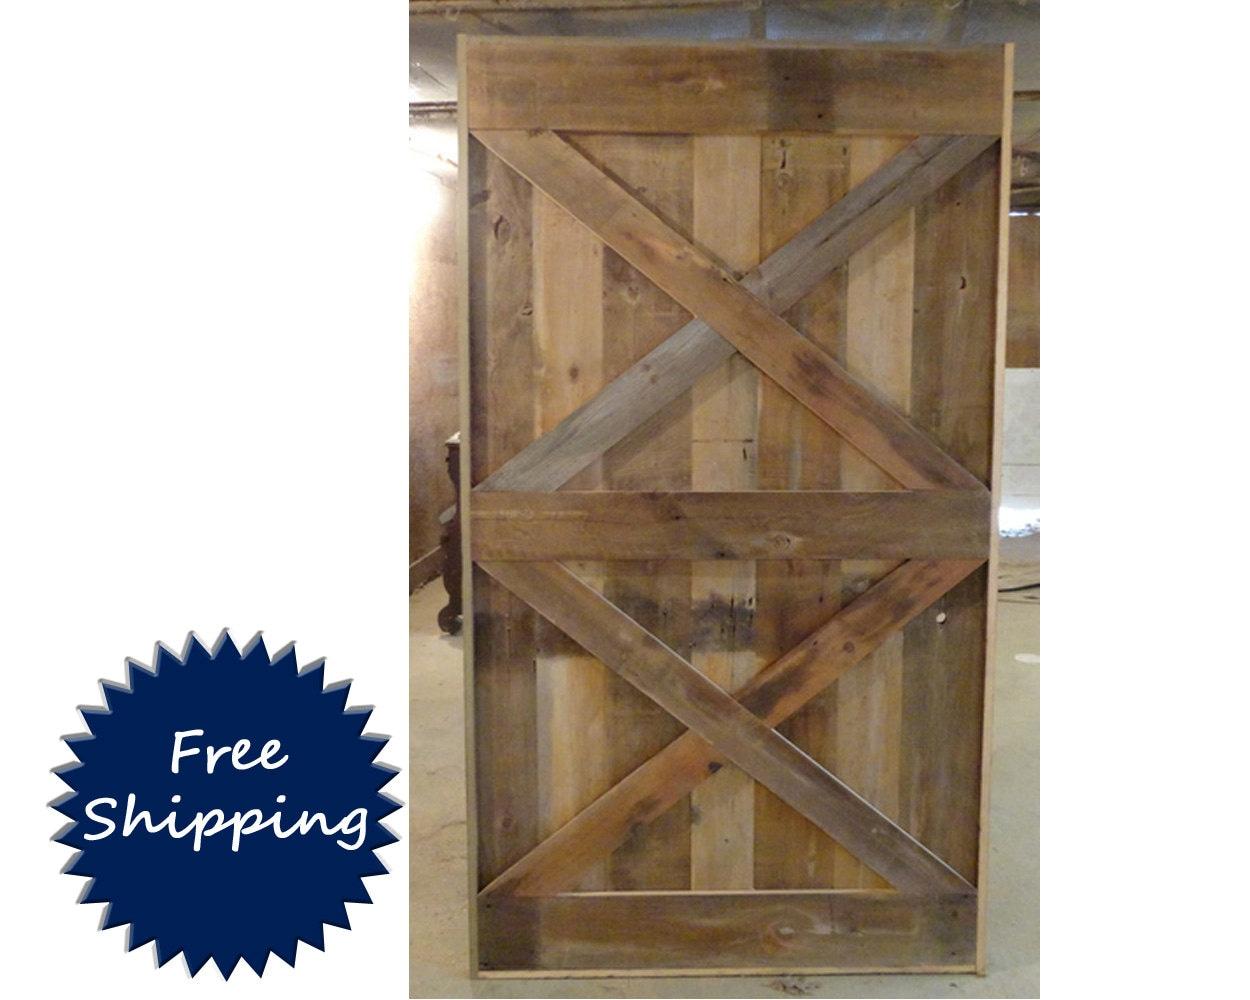 Double x brace barn door room divider made to order from for Barn door room divider